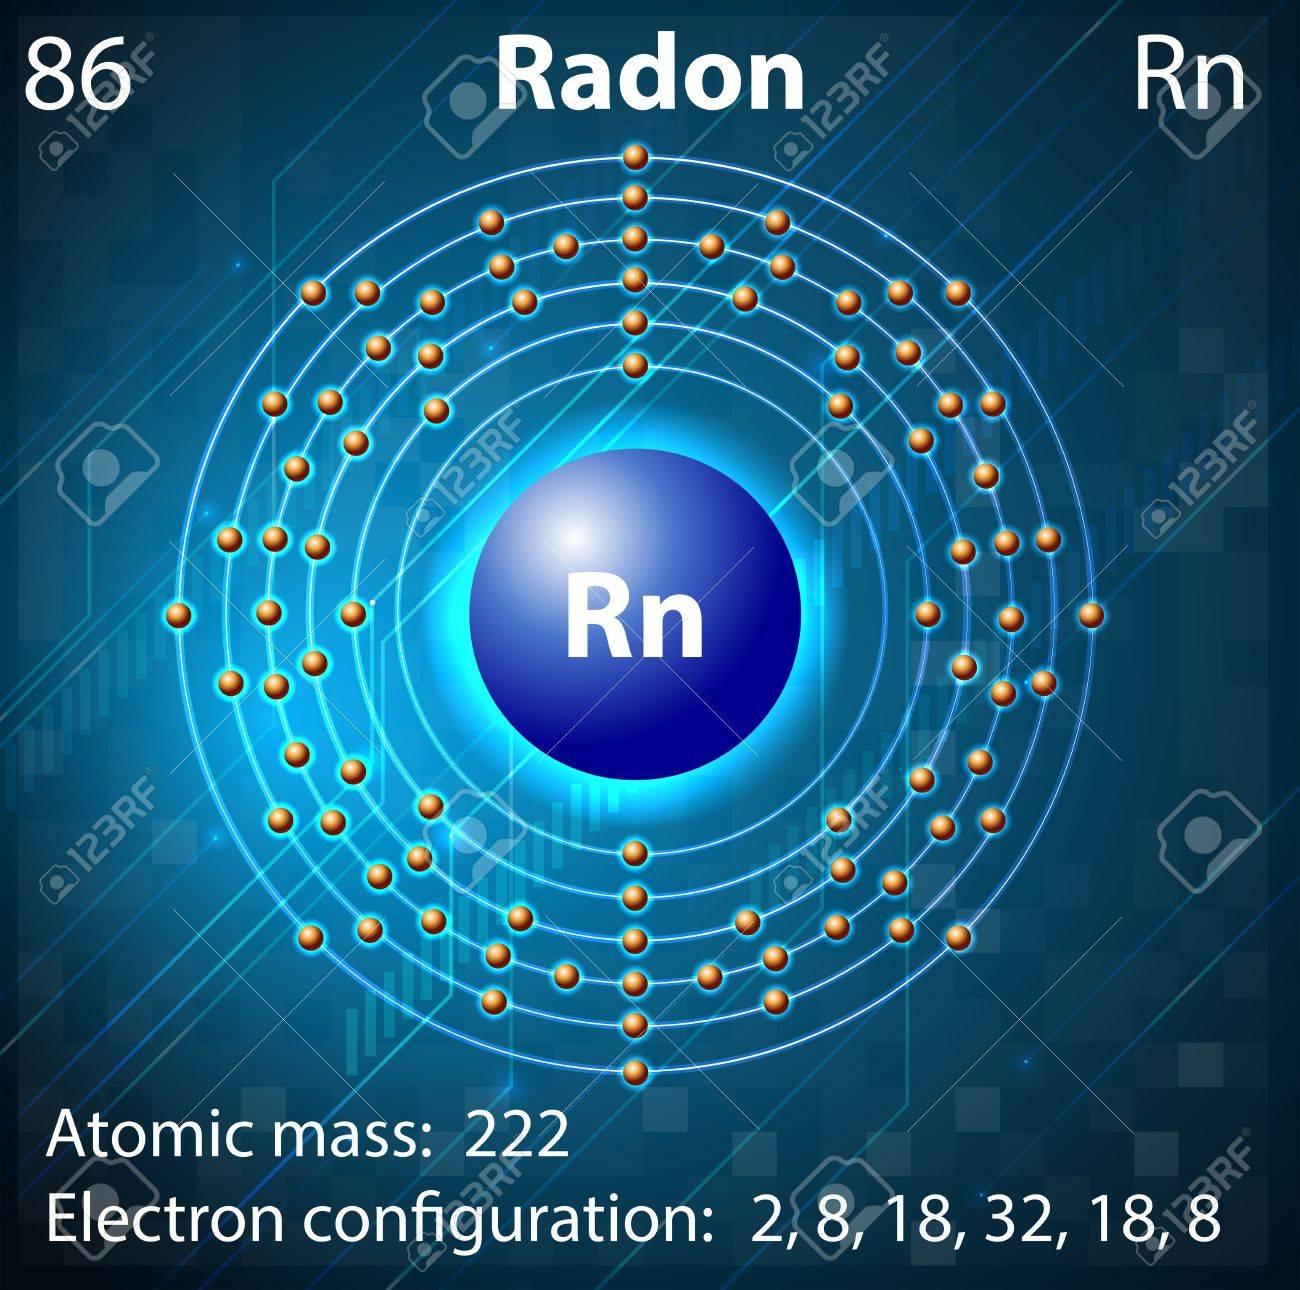 219 radon stock vector illustration and royalty free radon clipart illustration of the element radon buycottarizona